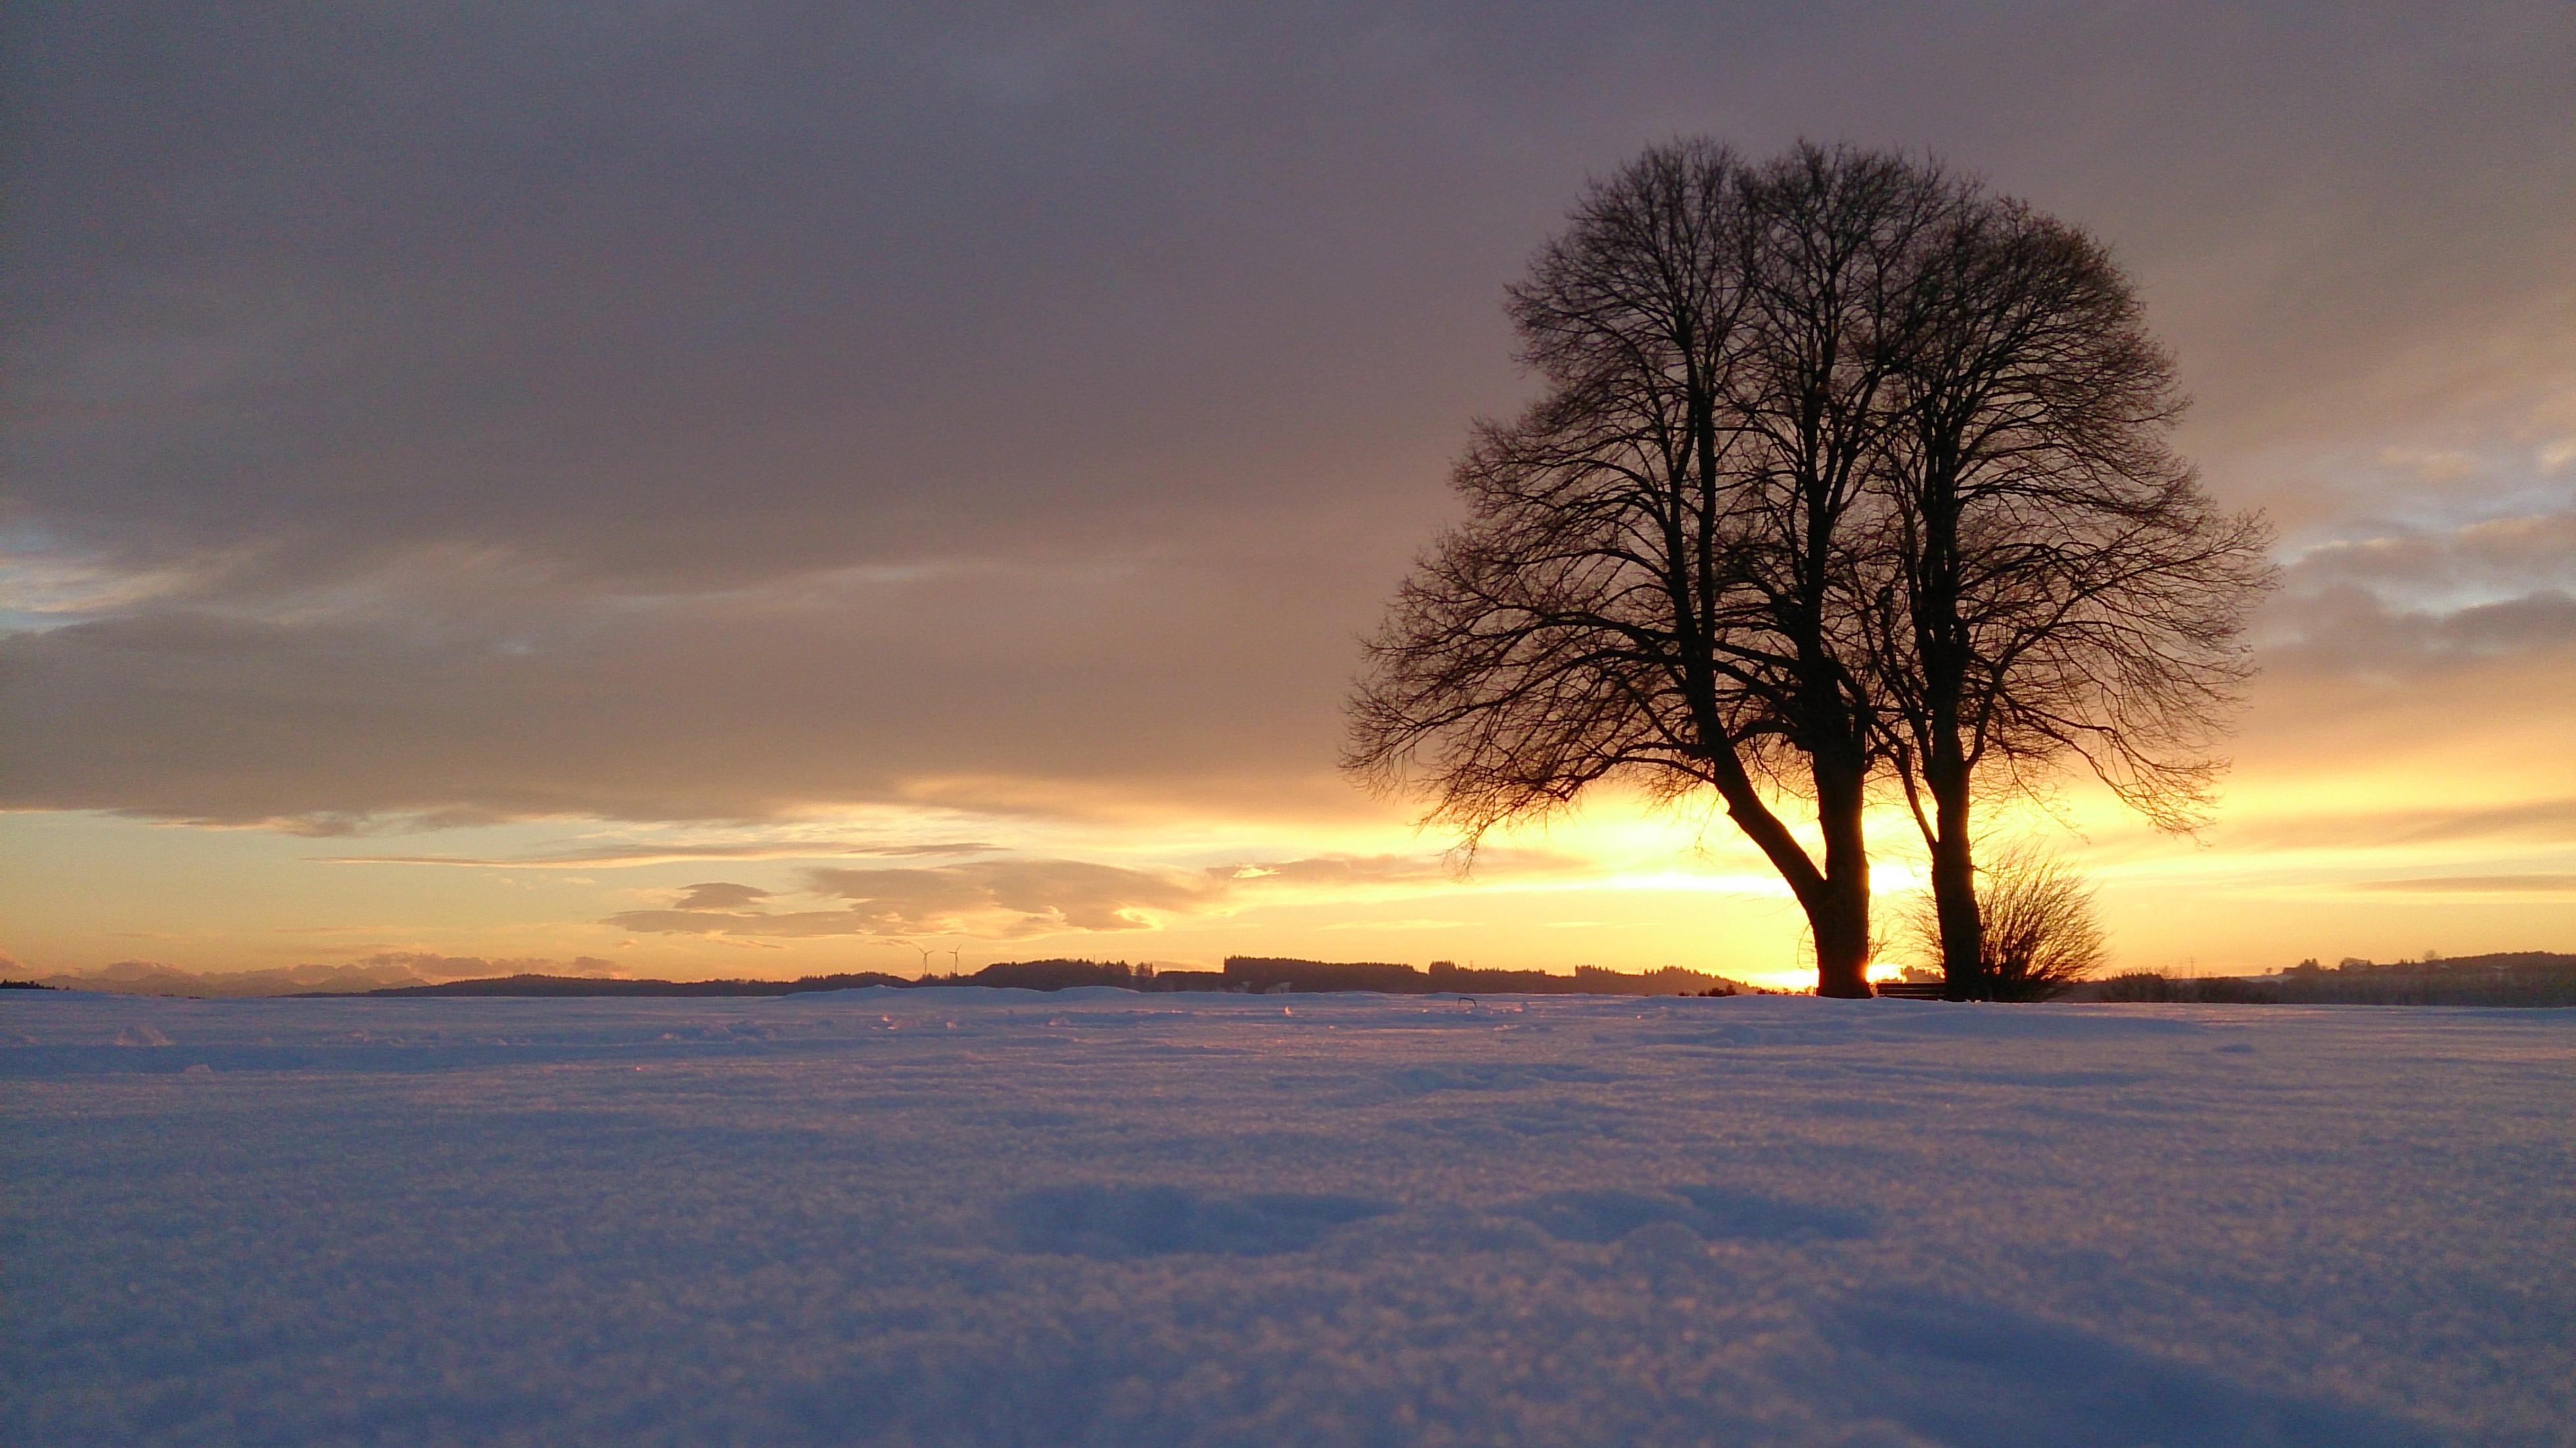 Winterlinde, Tilia cordata